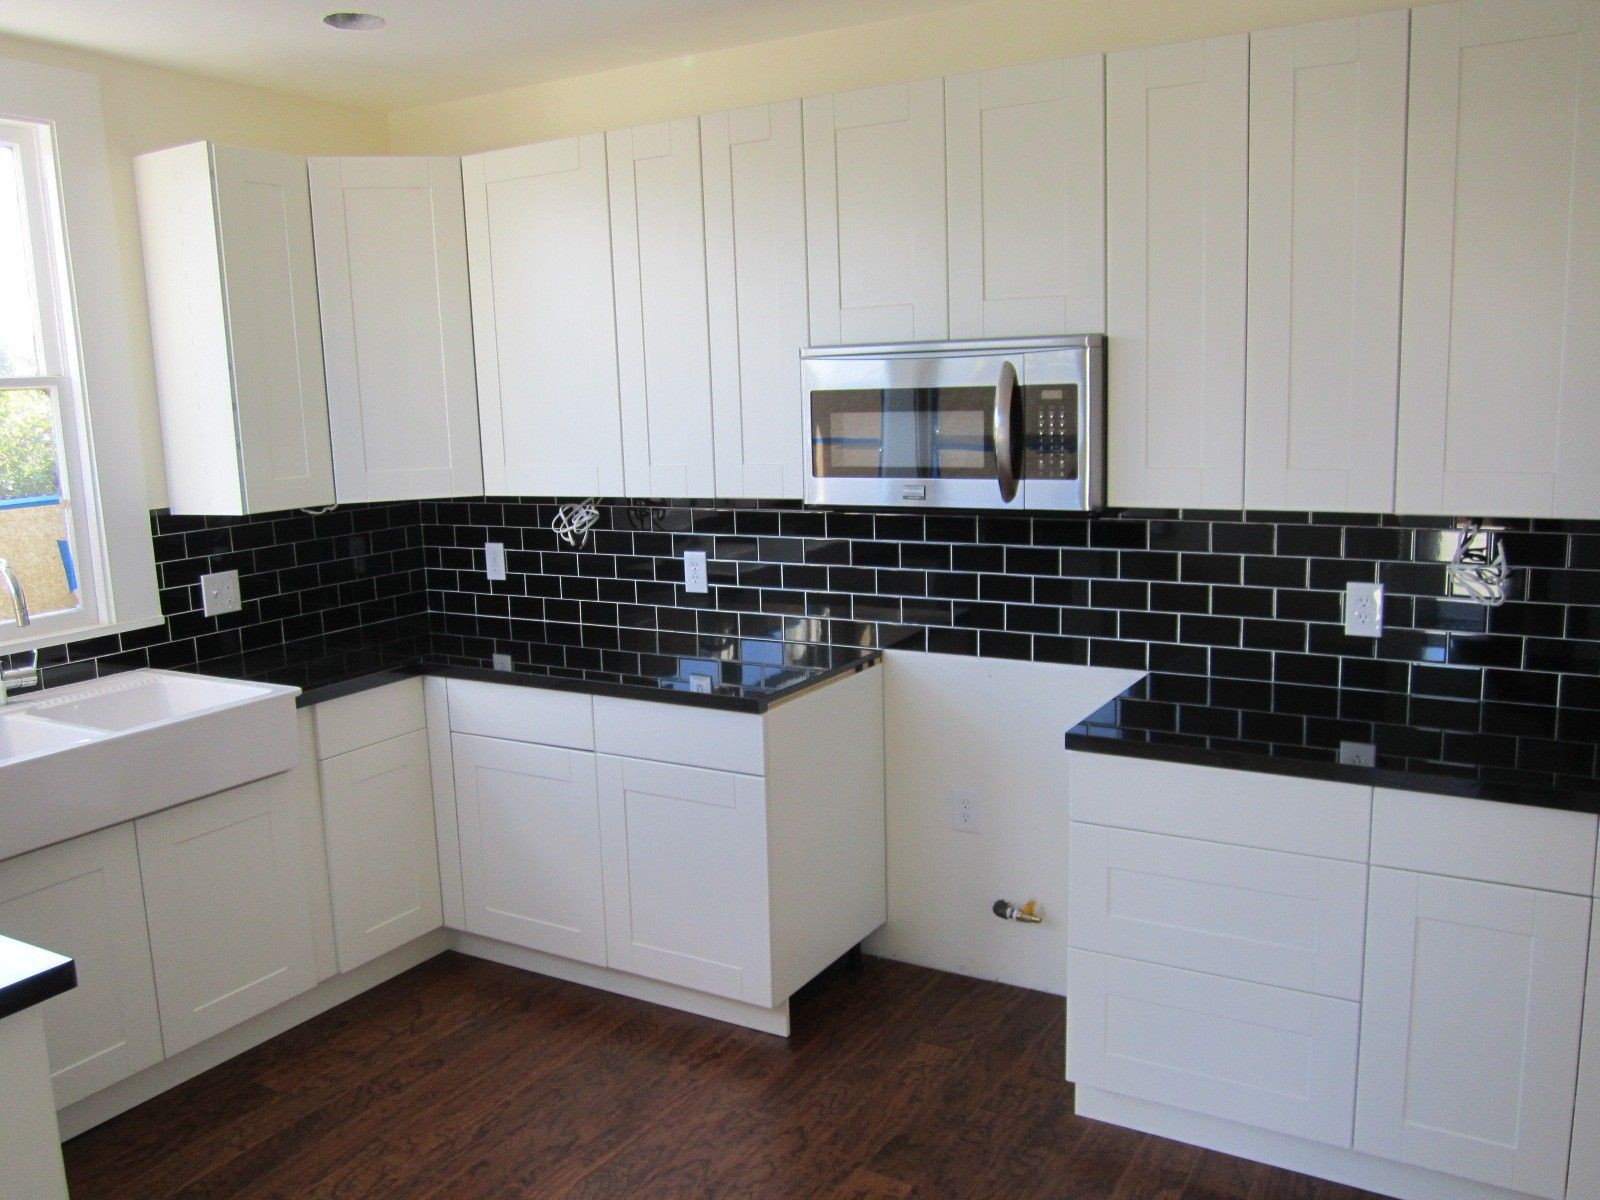 Black ceramic tile kitchen backsplash with white cabinet kitchen